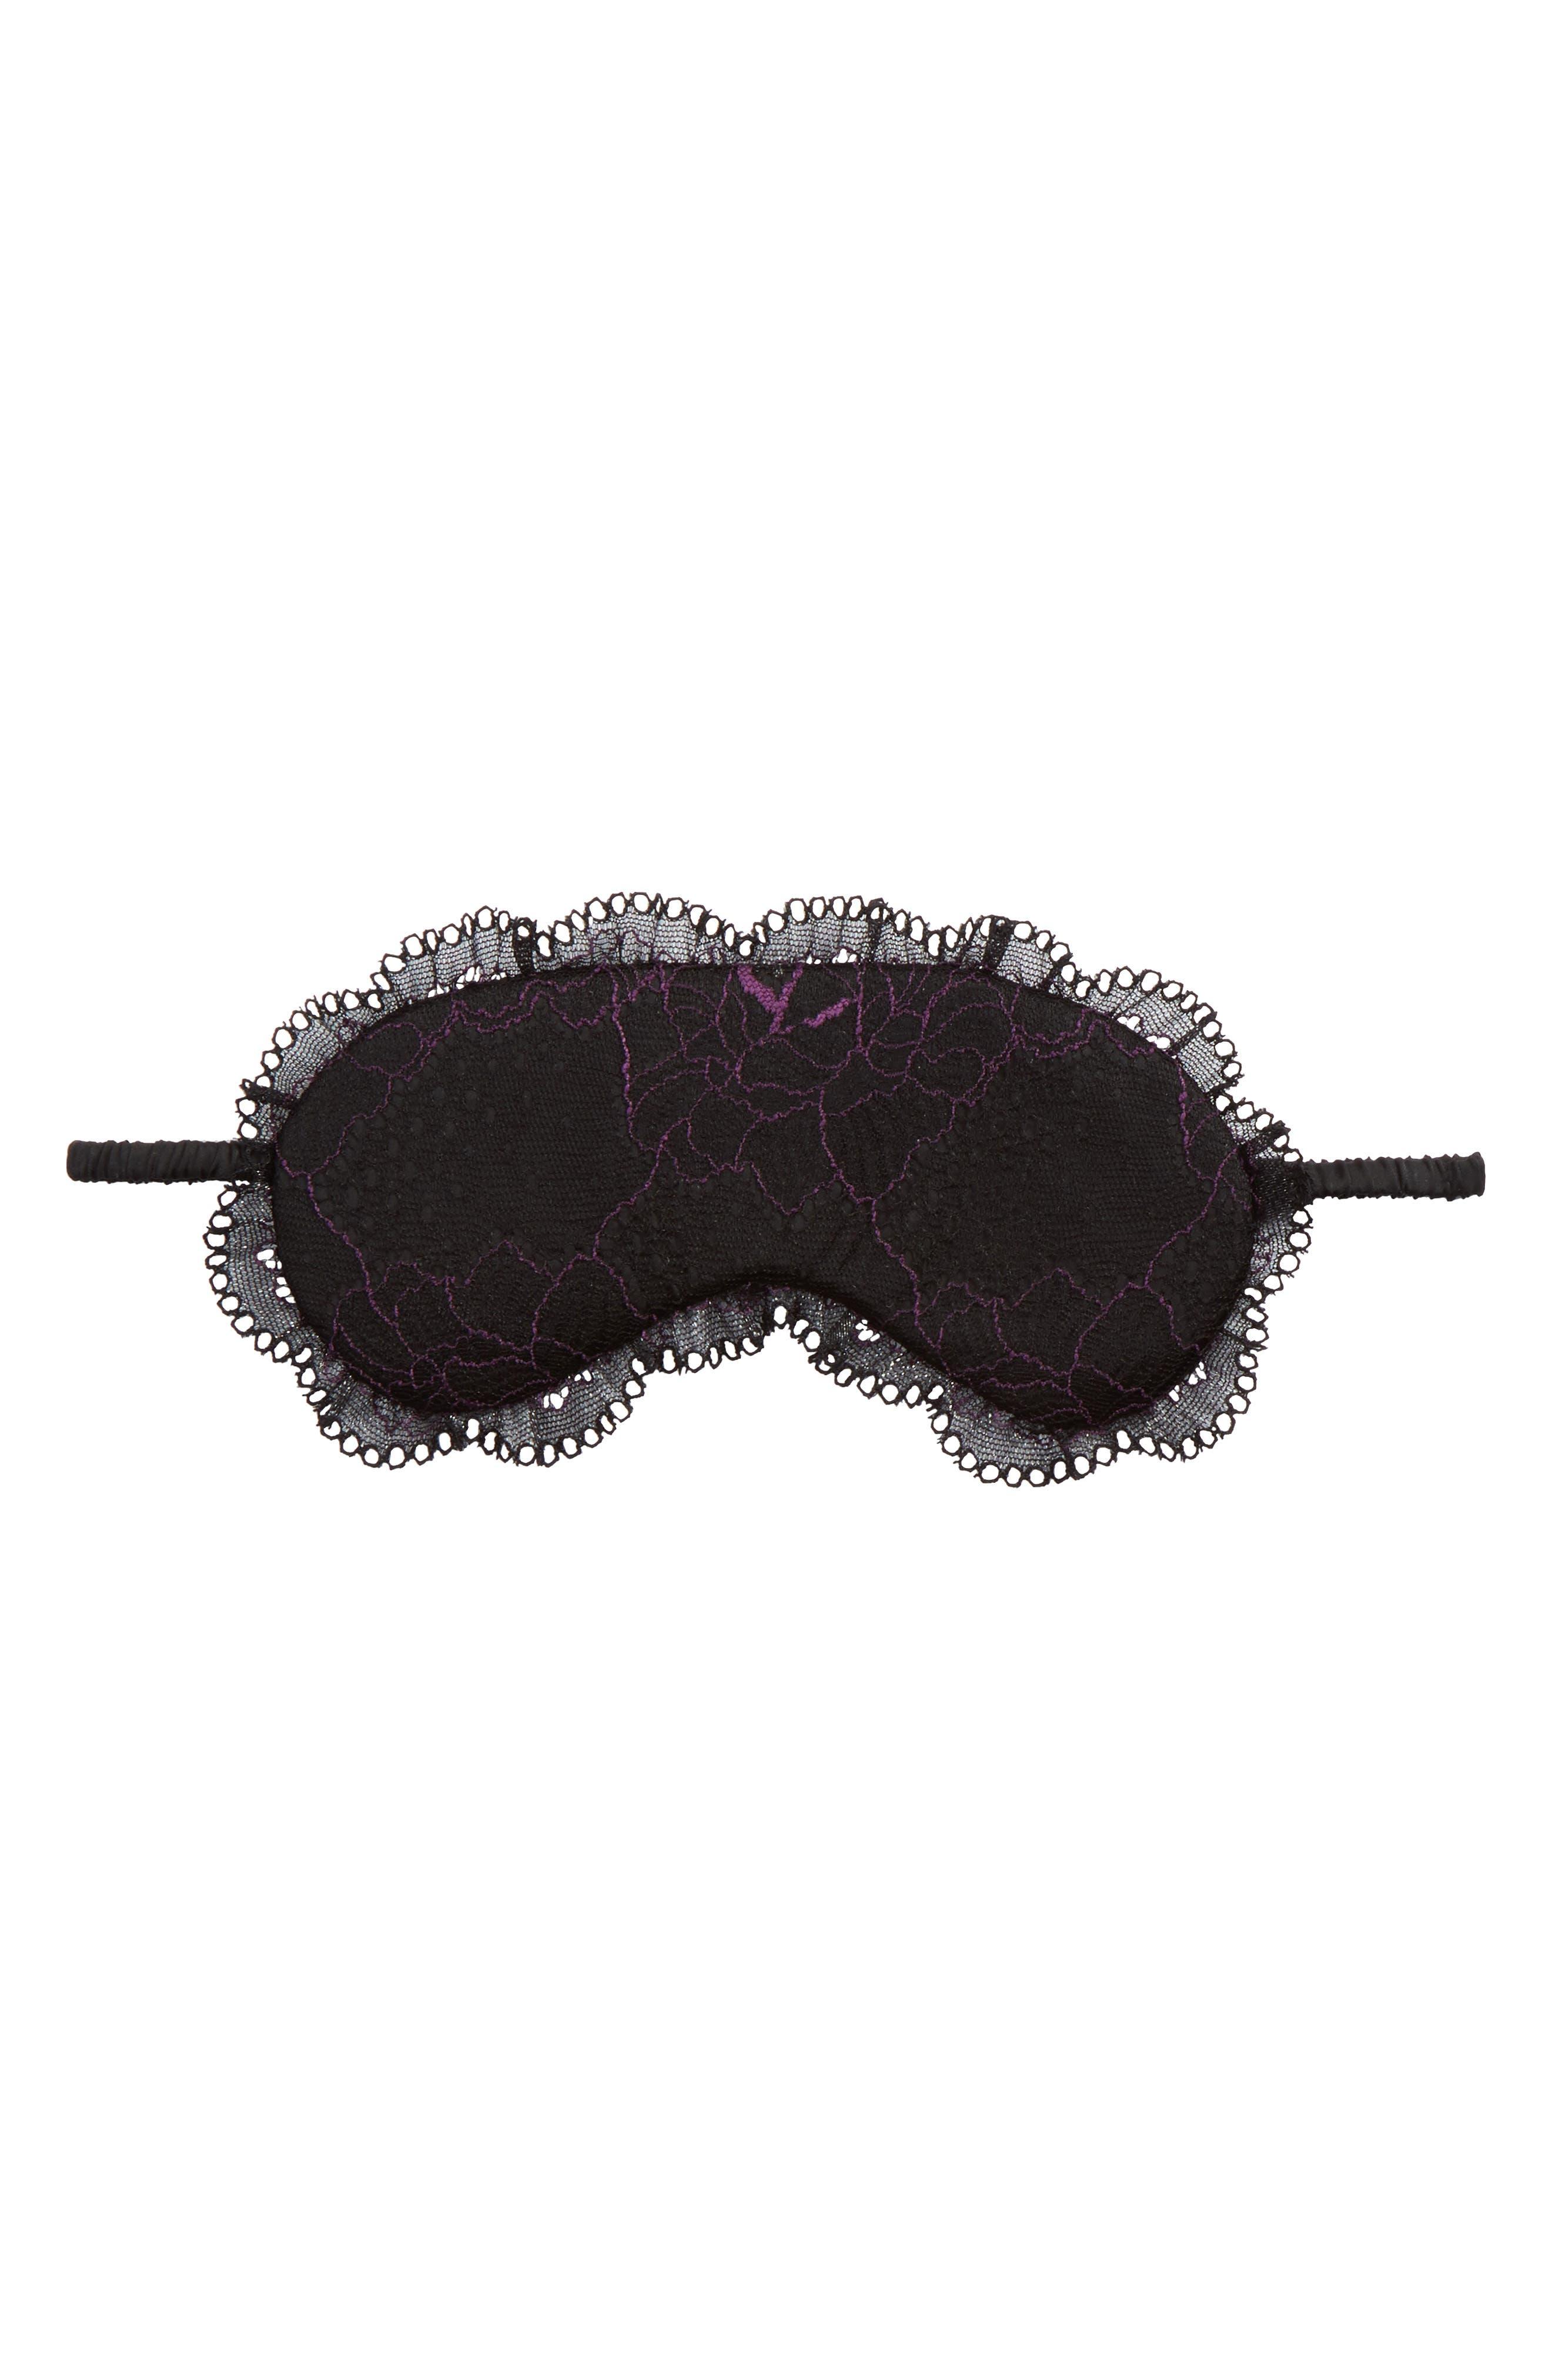 Flirty Sleep Mask,                         Main,                         color, Black/ Purple Dragon